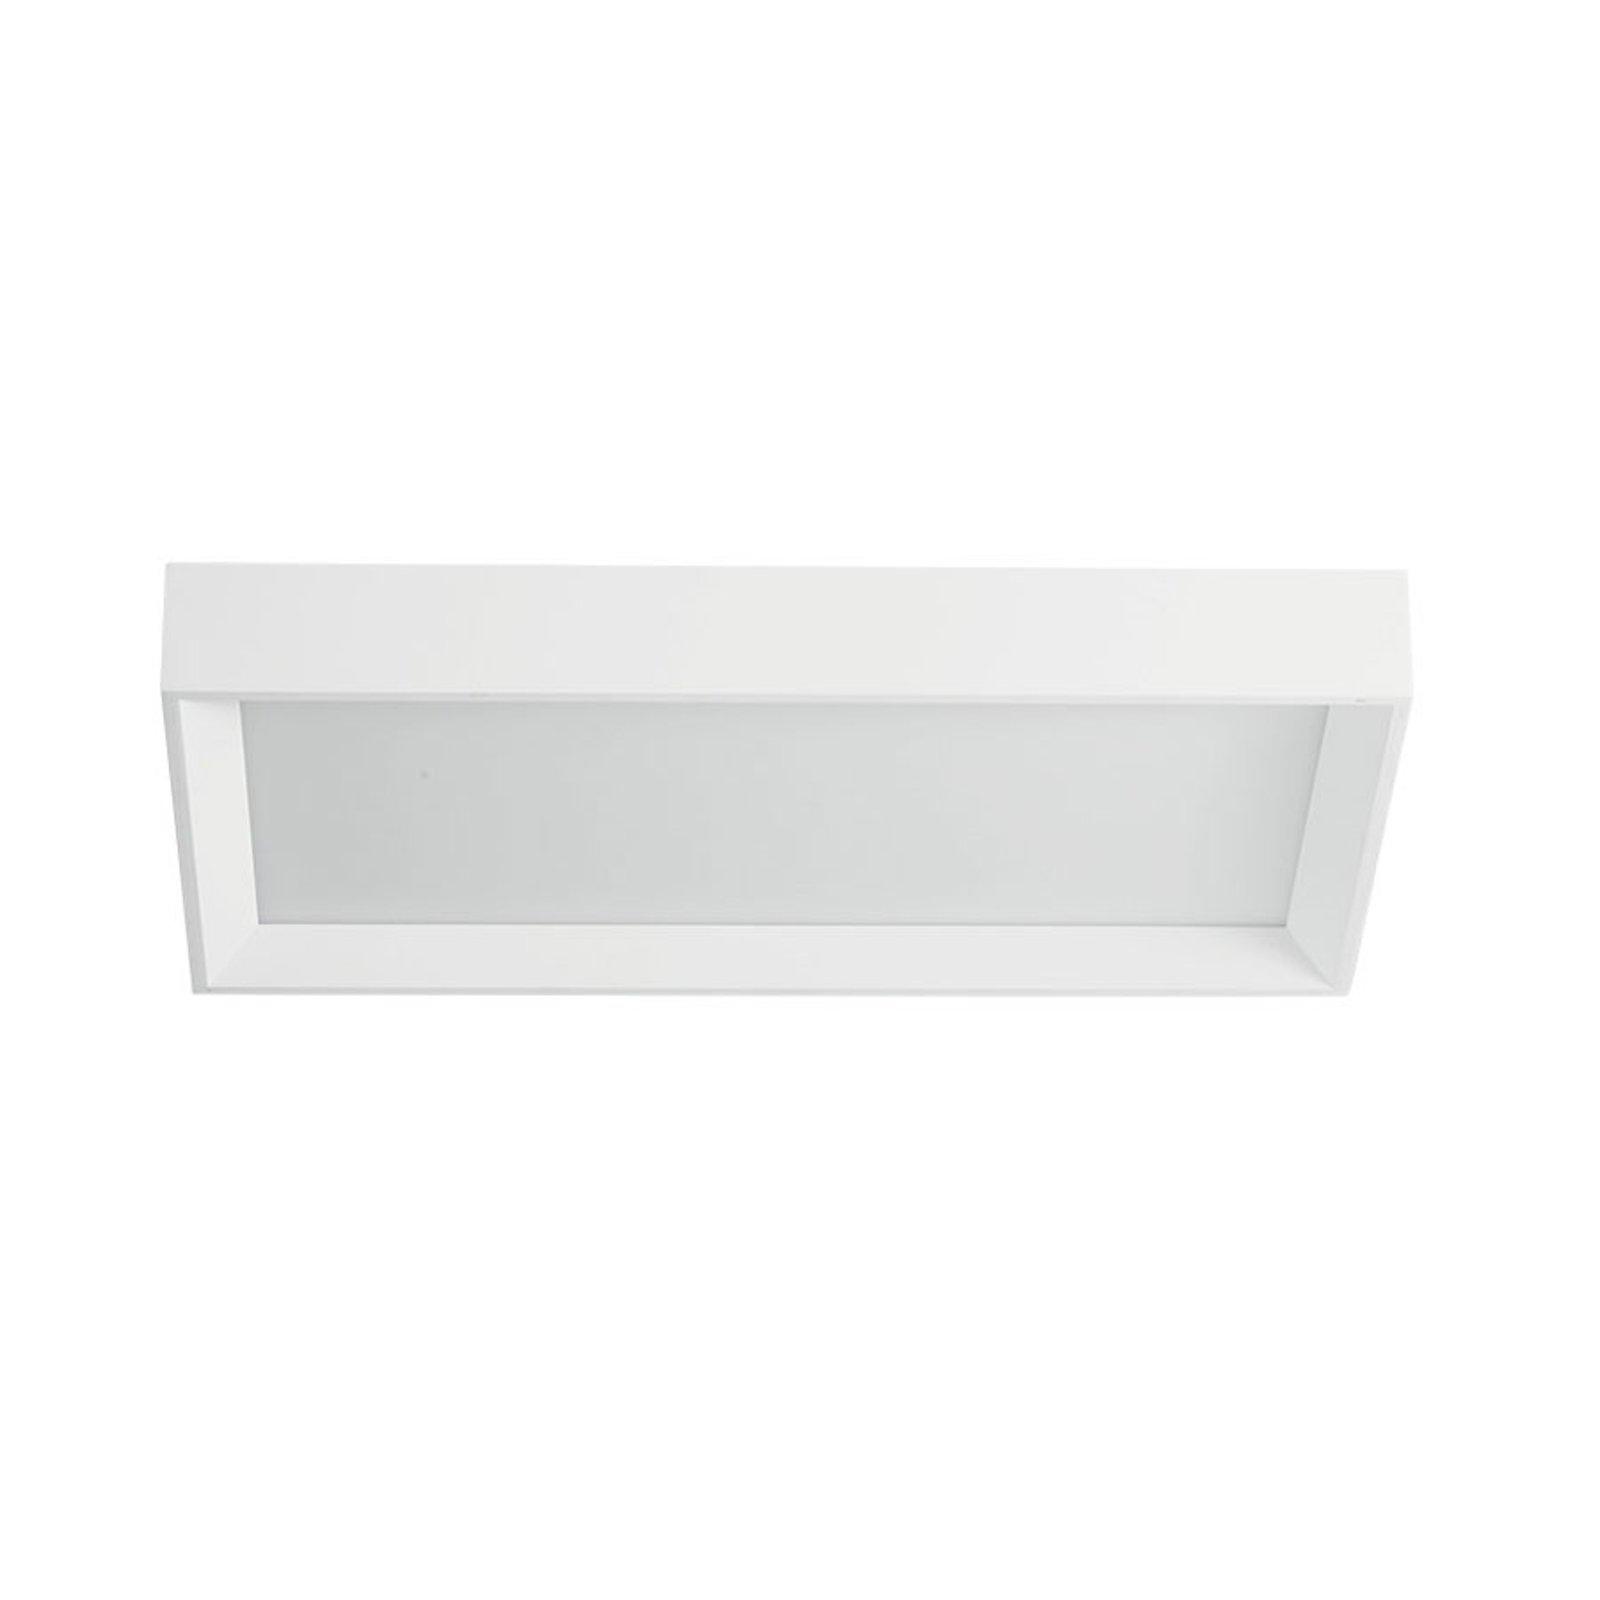 Tara LED-taklampe dimbar, 54 x 29 cm